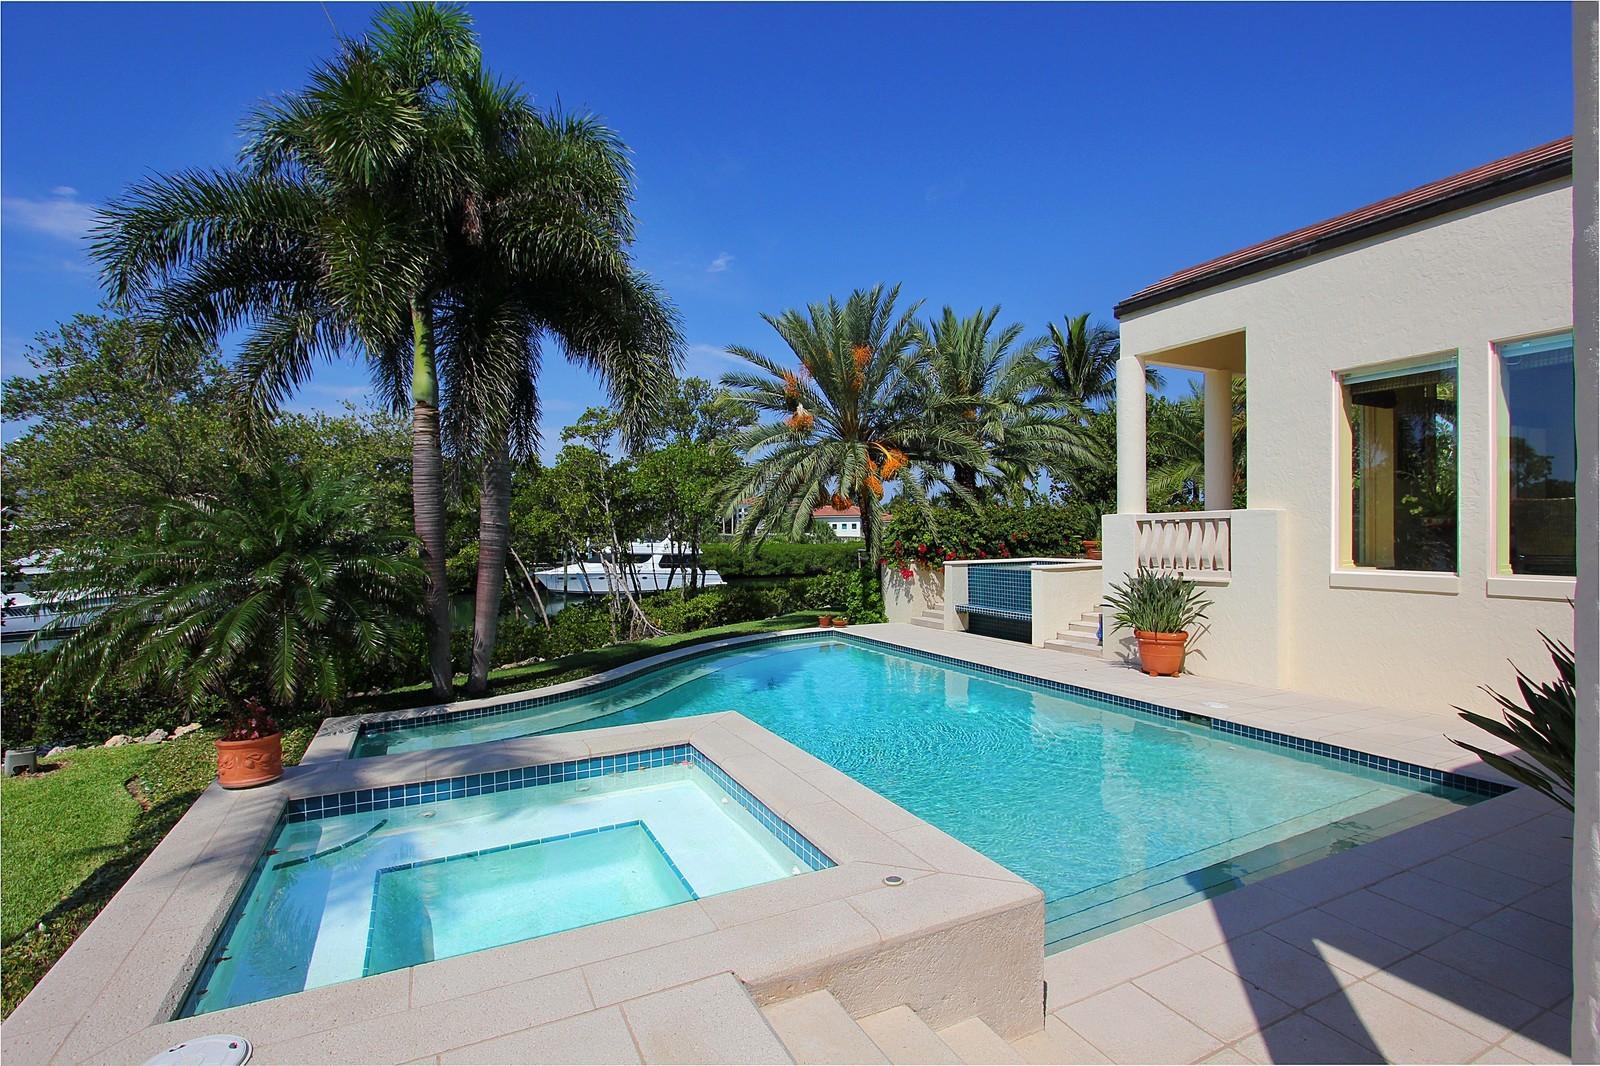 Real Estate Photography - 6814 SE Isle Way, Stuart, FL, 34996 - Pool